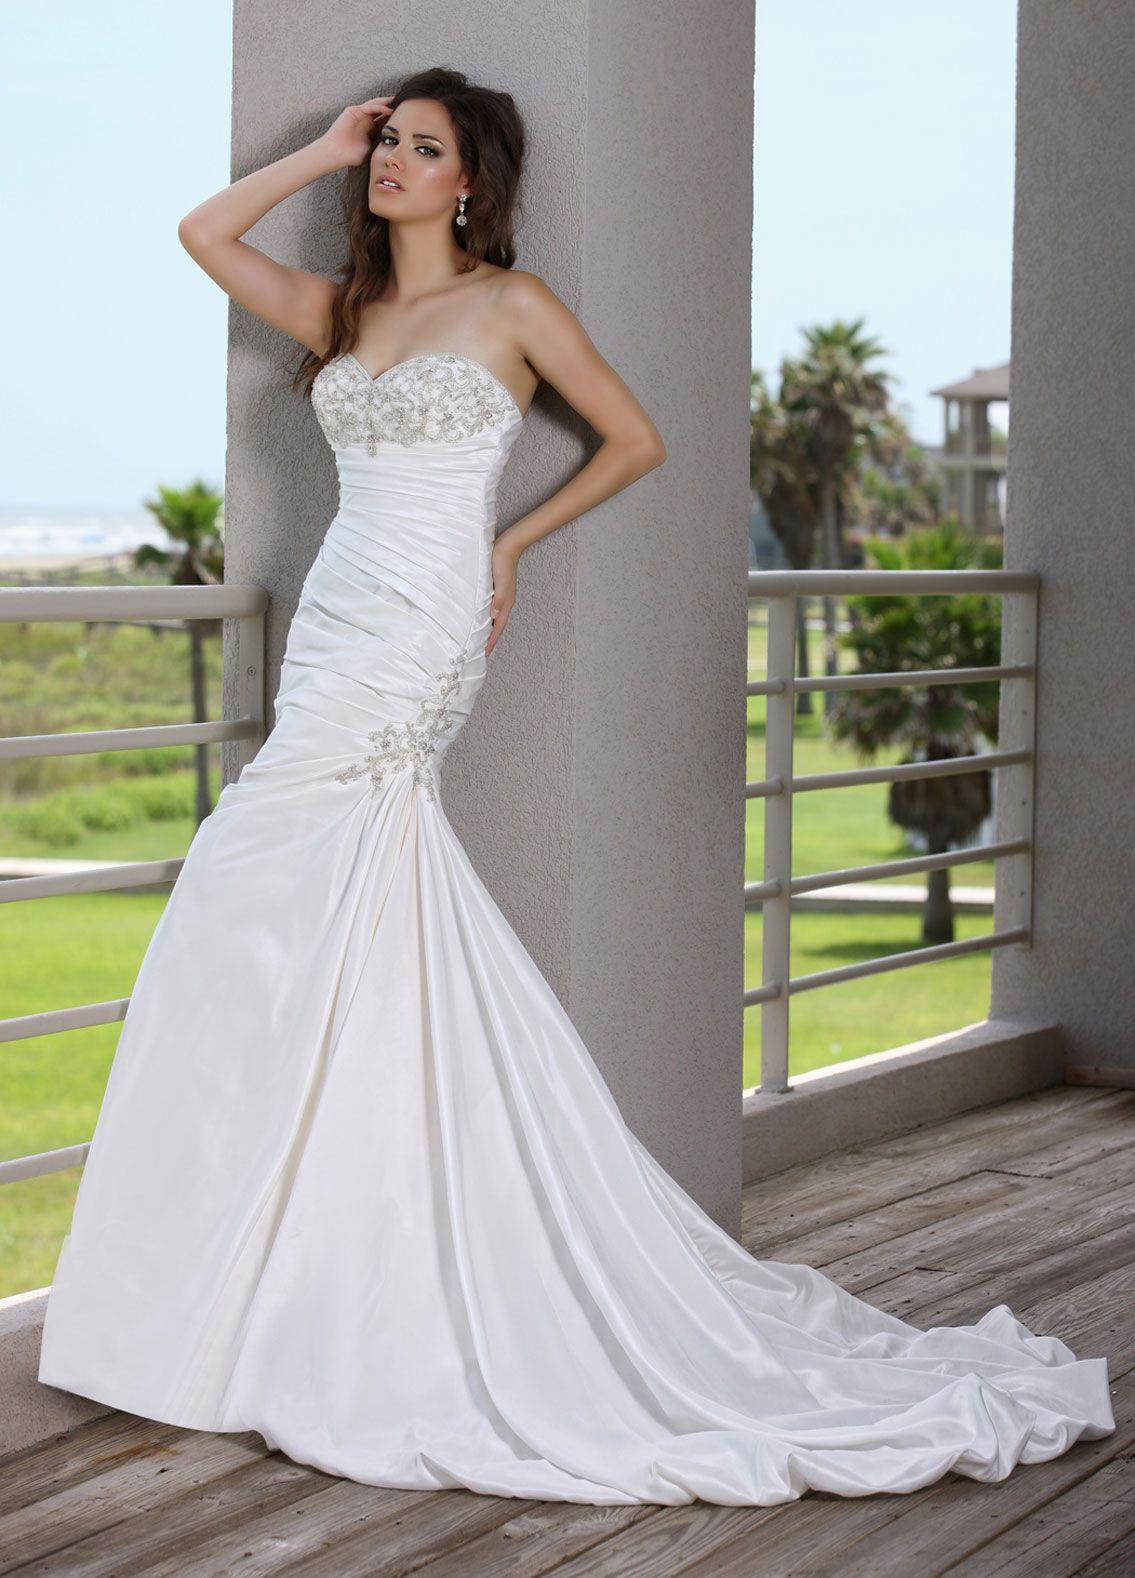 Trumpet style wedding dresses  Taffeta mermaid with beautiful sparkling beading on bodice and trim